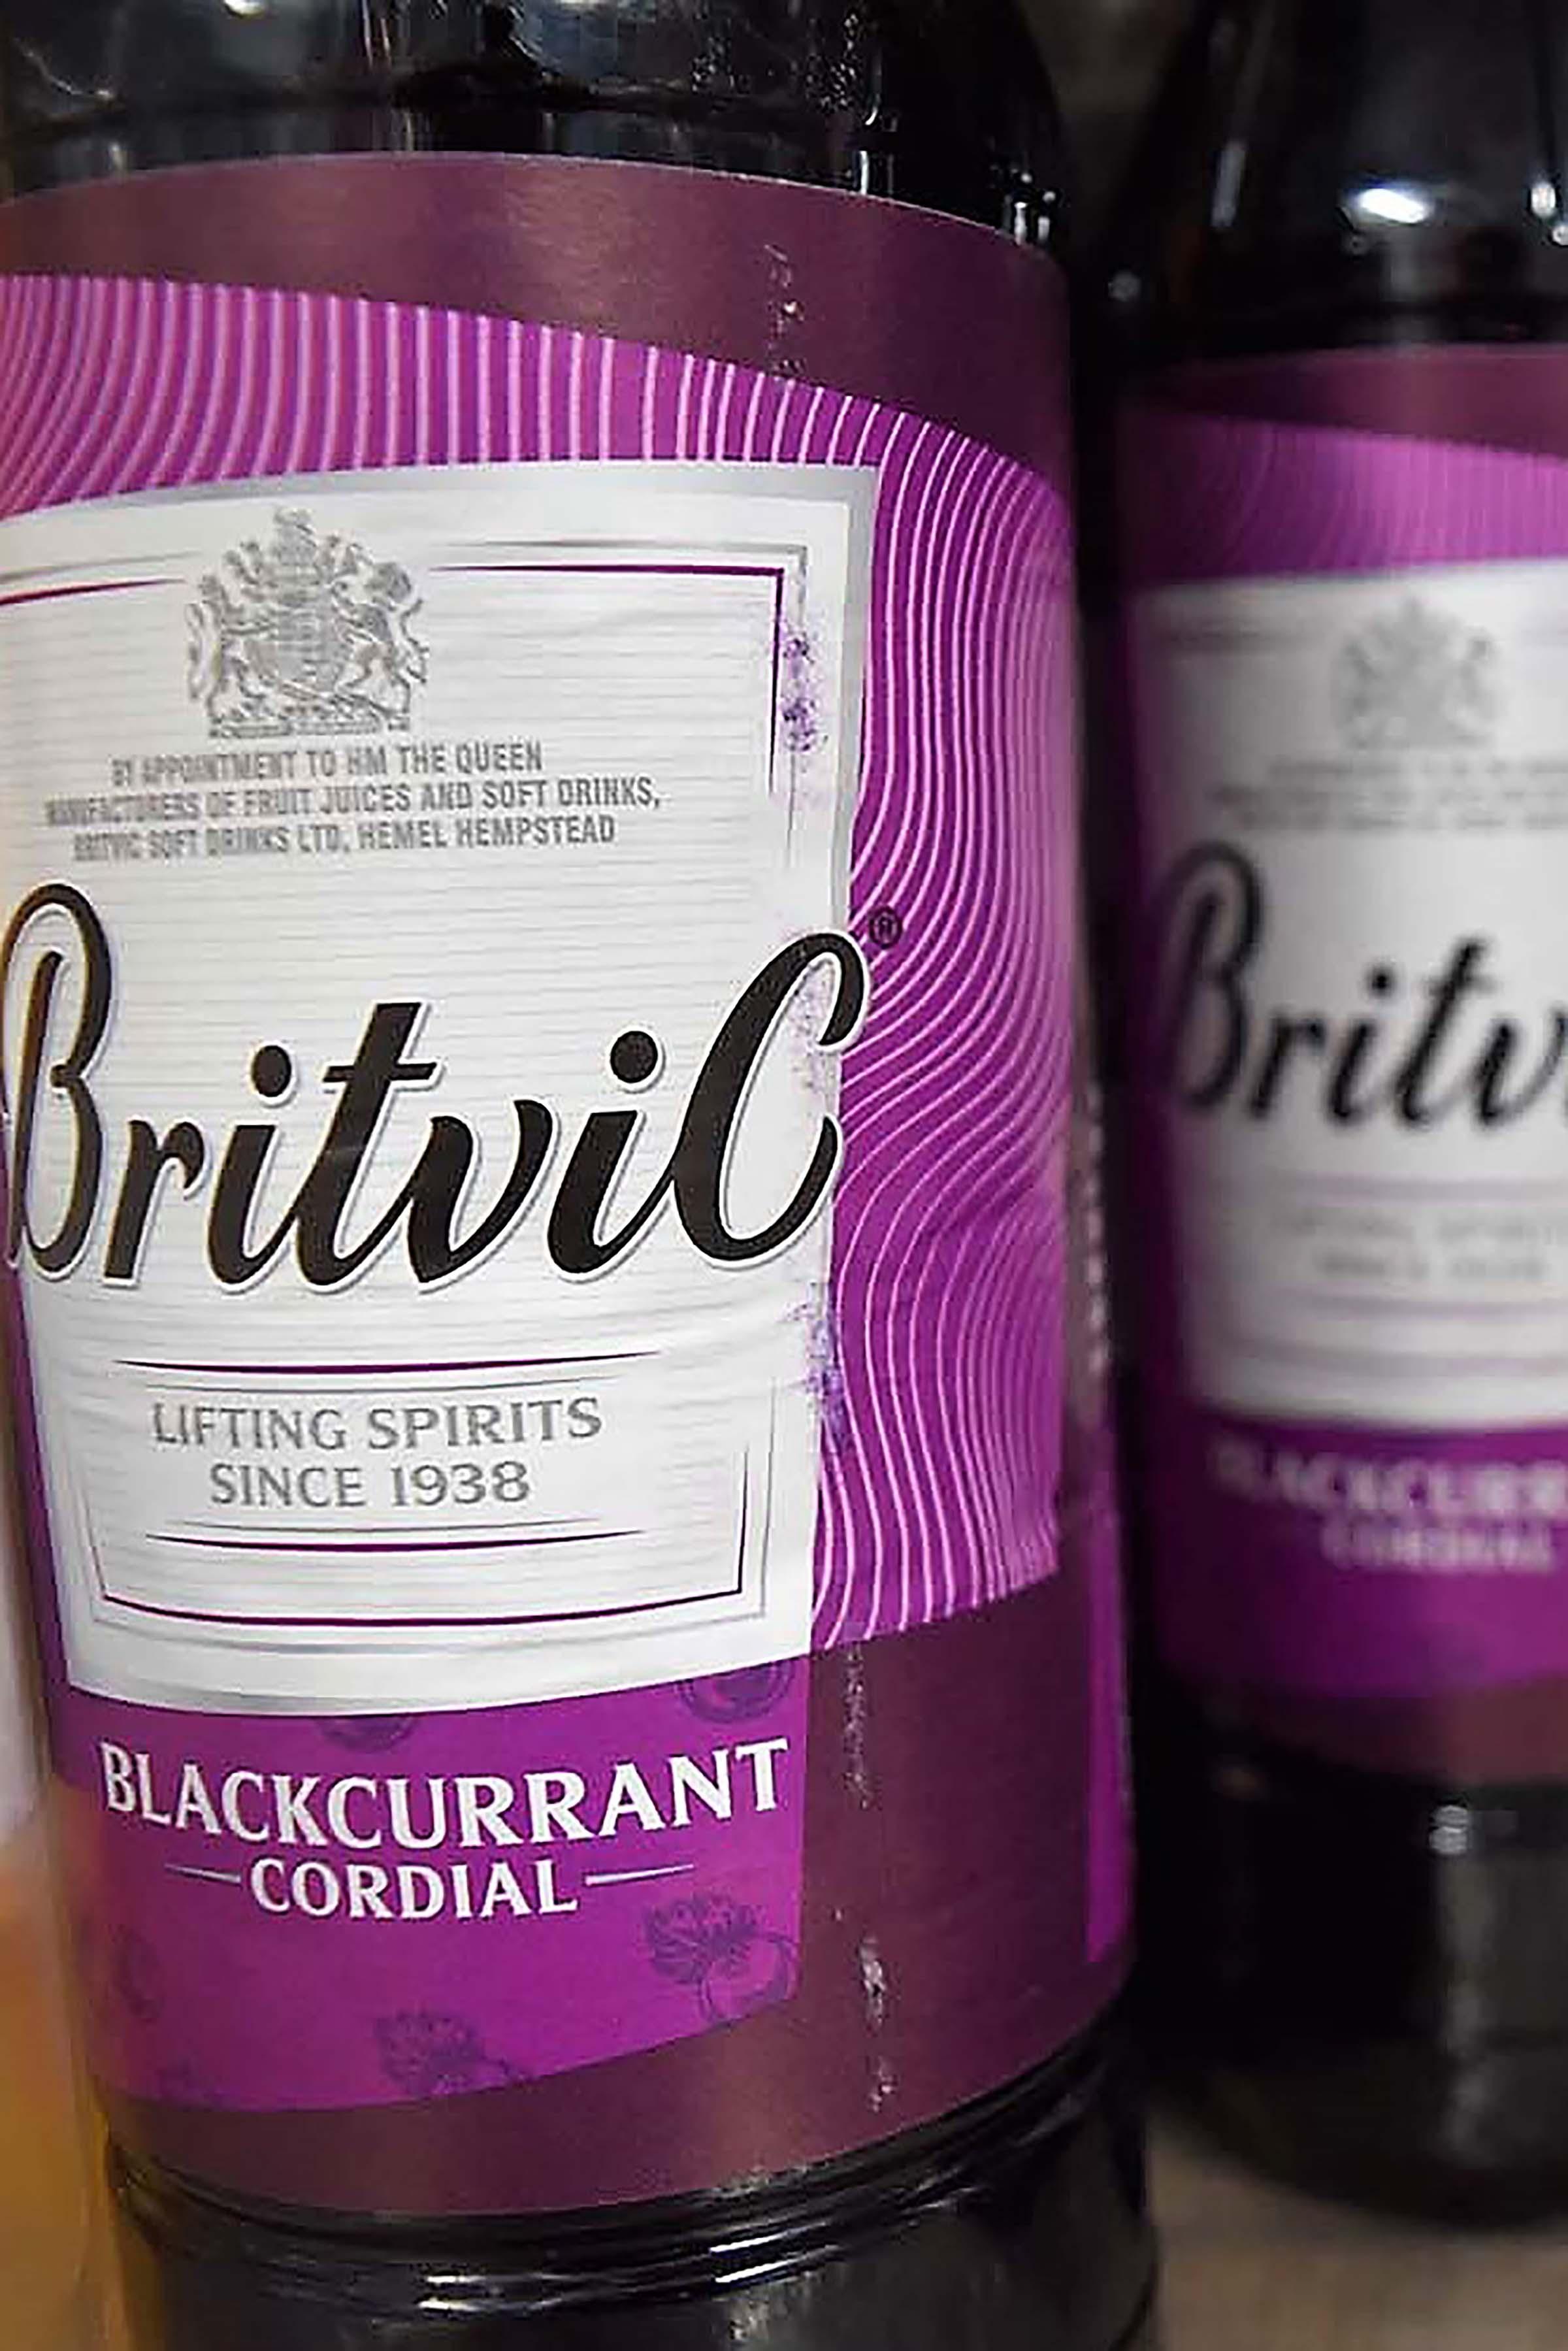 Britvic Blackcurrant Cordial ltr